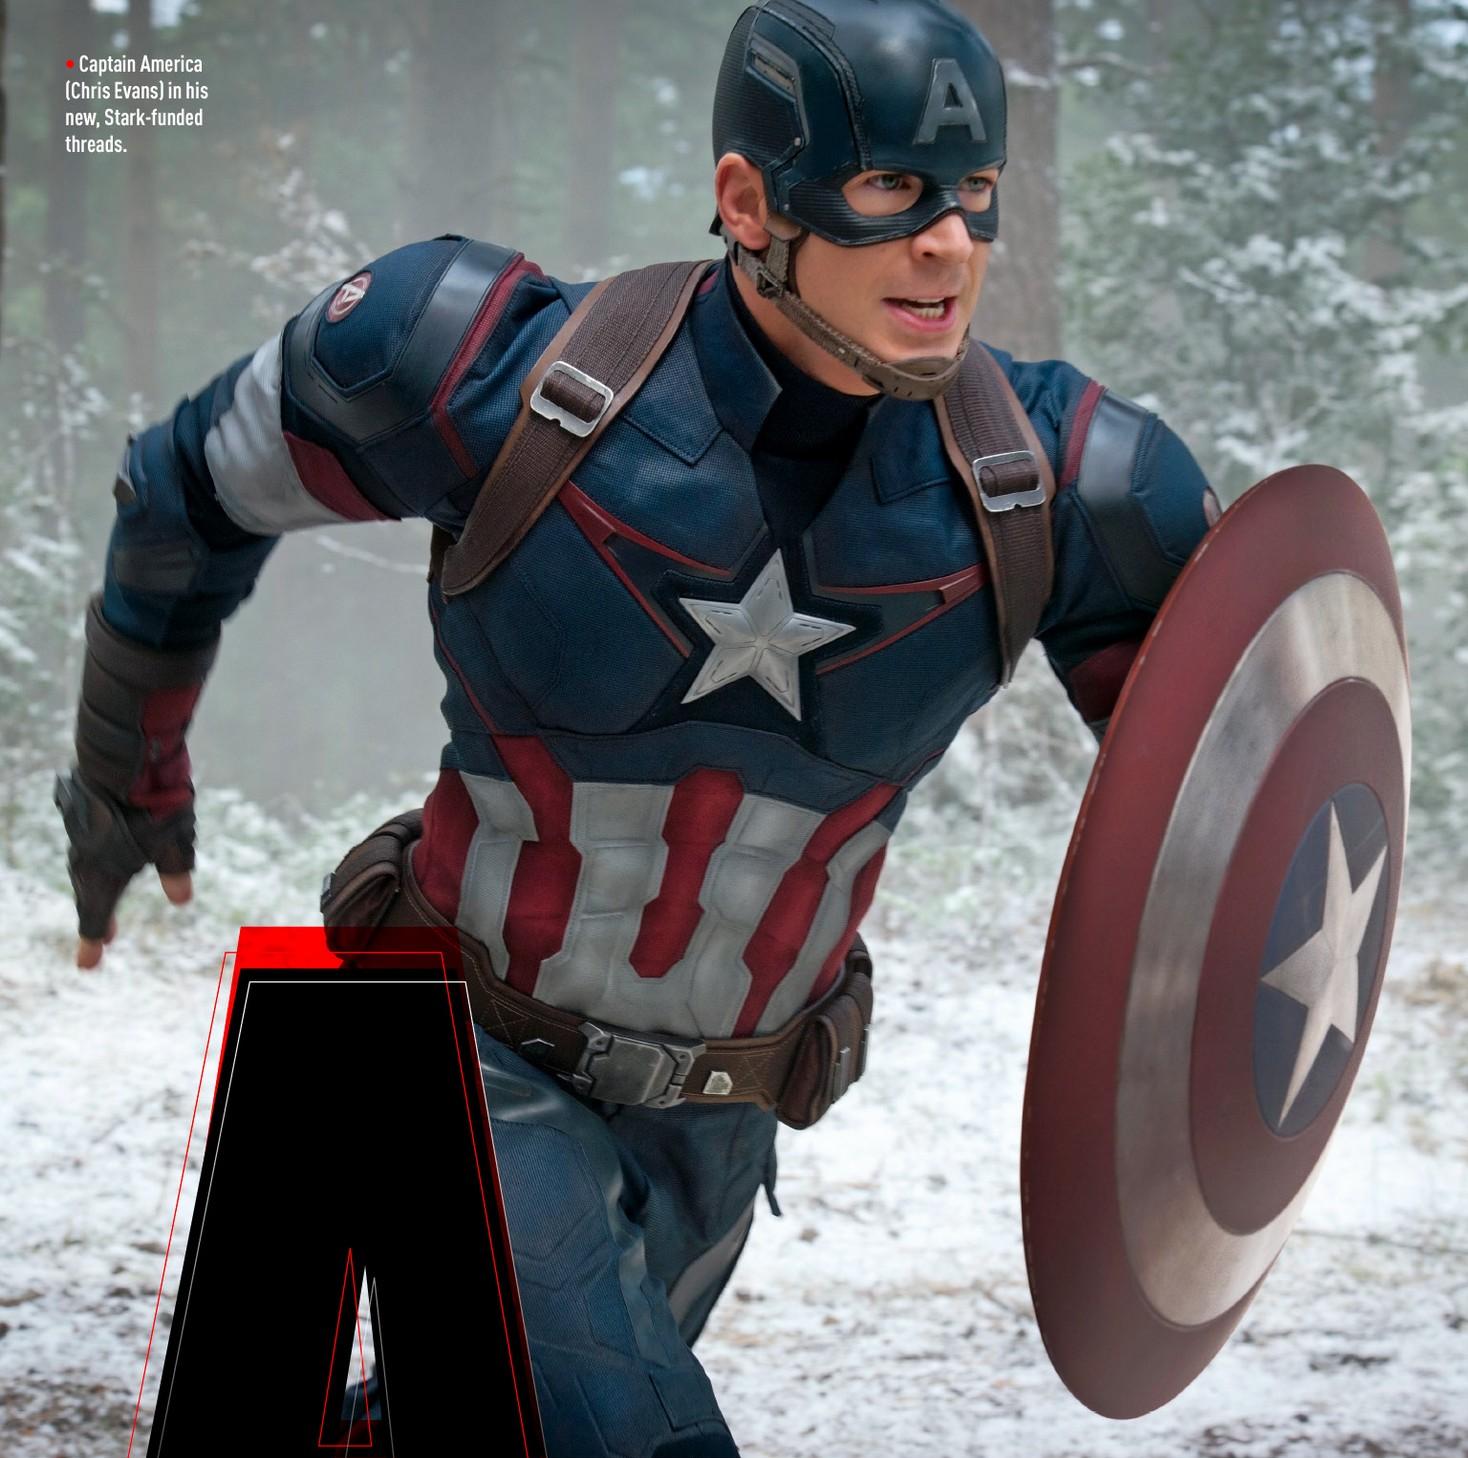 Avengers Age Of Ultron Captain America Captain America Civil War Chris Evans Captain America